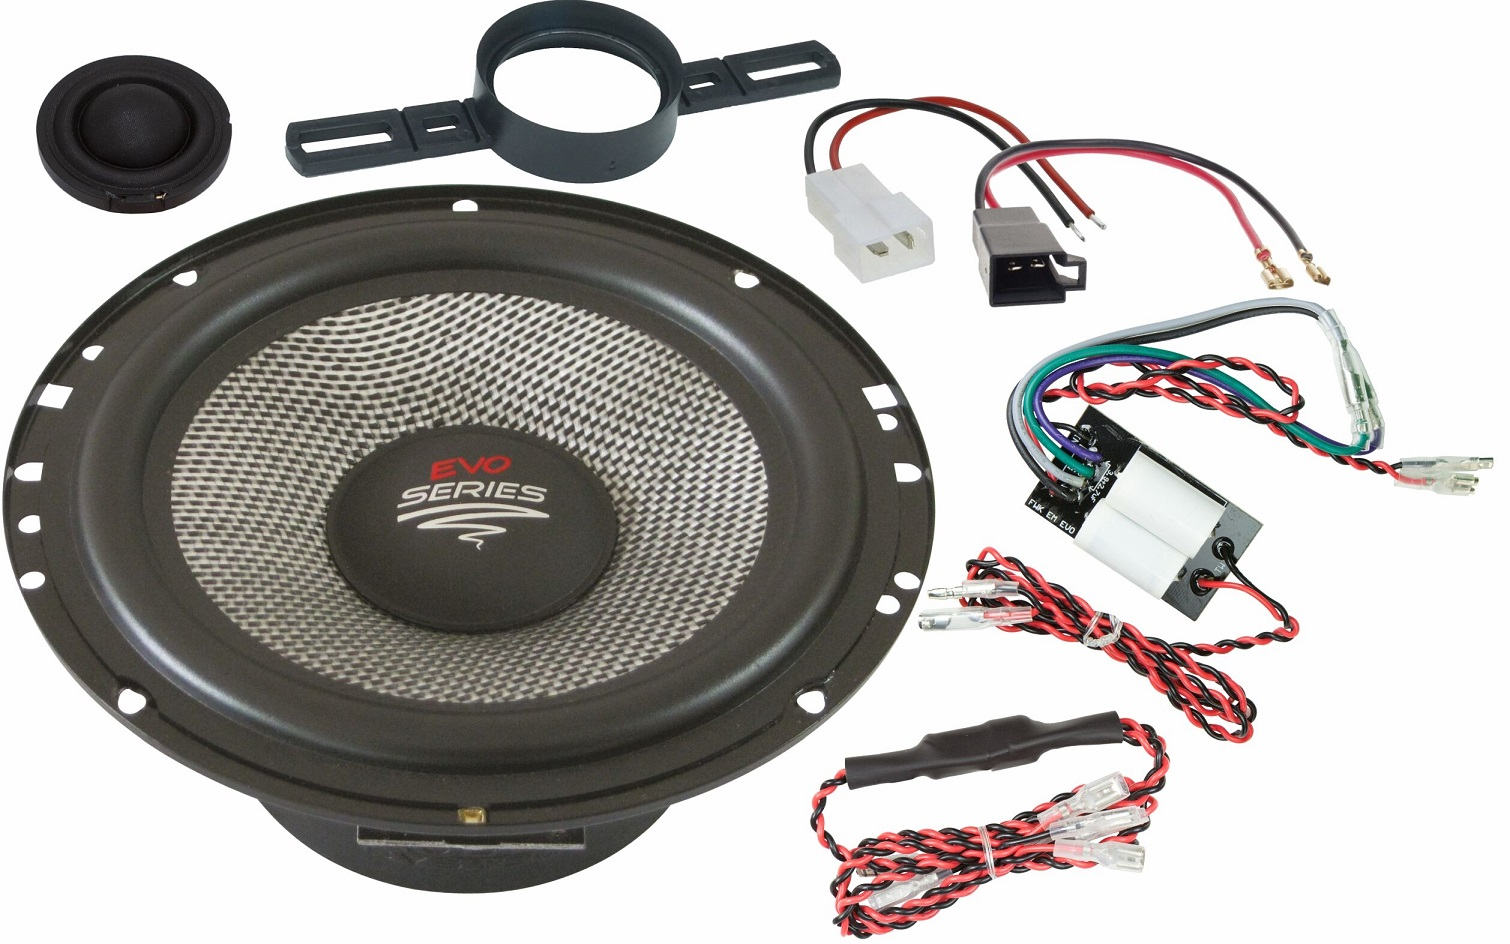 Audio System X 165 DUCATO EVO 2 kompatibel mit FIAT DUCATO 2-Wege 16,5cm X--ion SERIES 2-Wege Spezial System